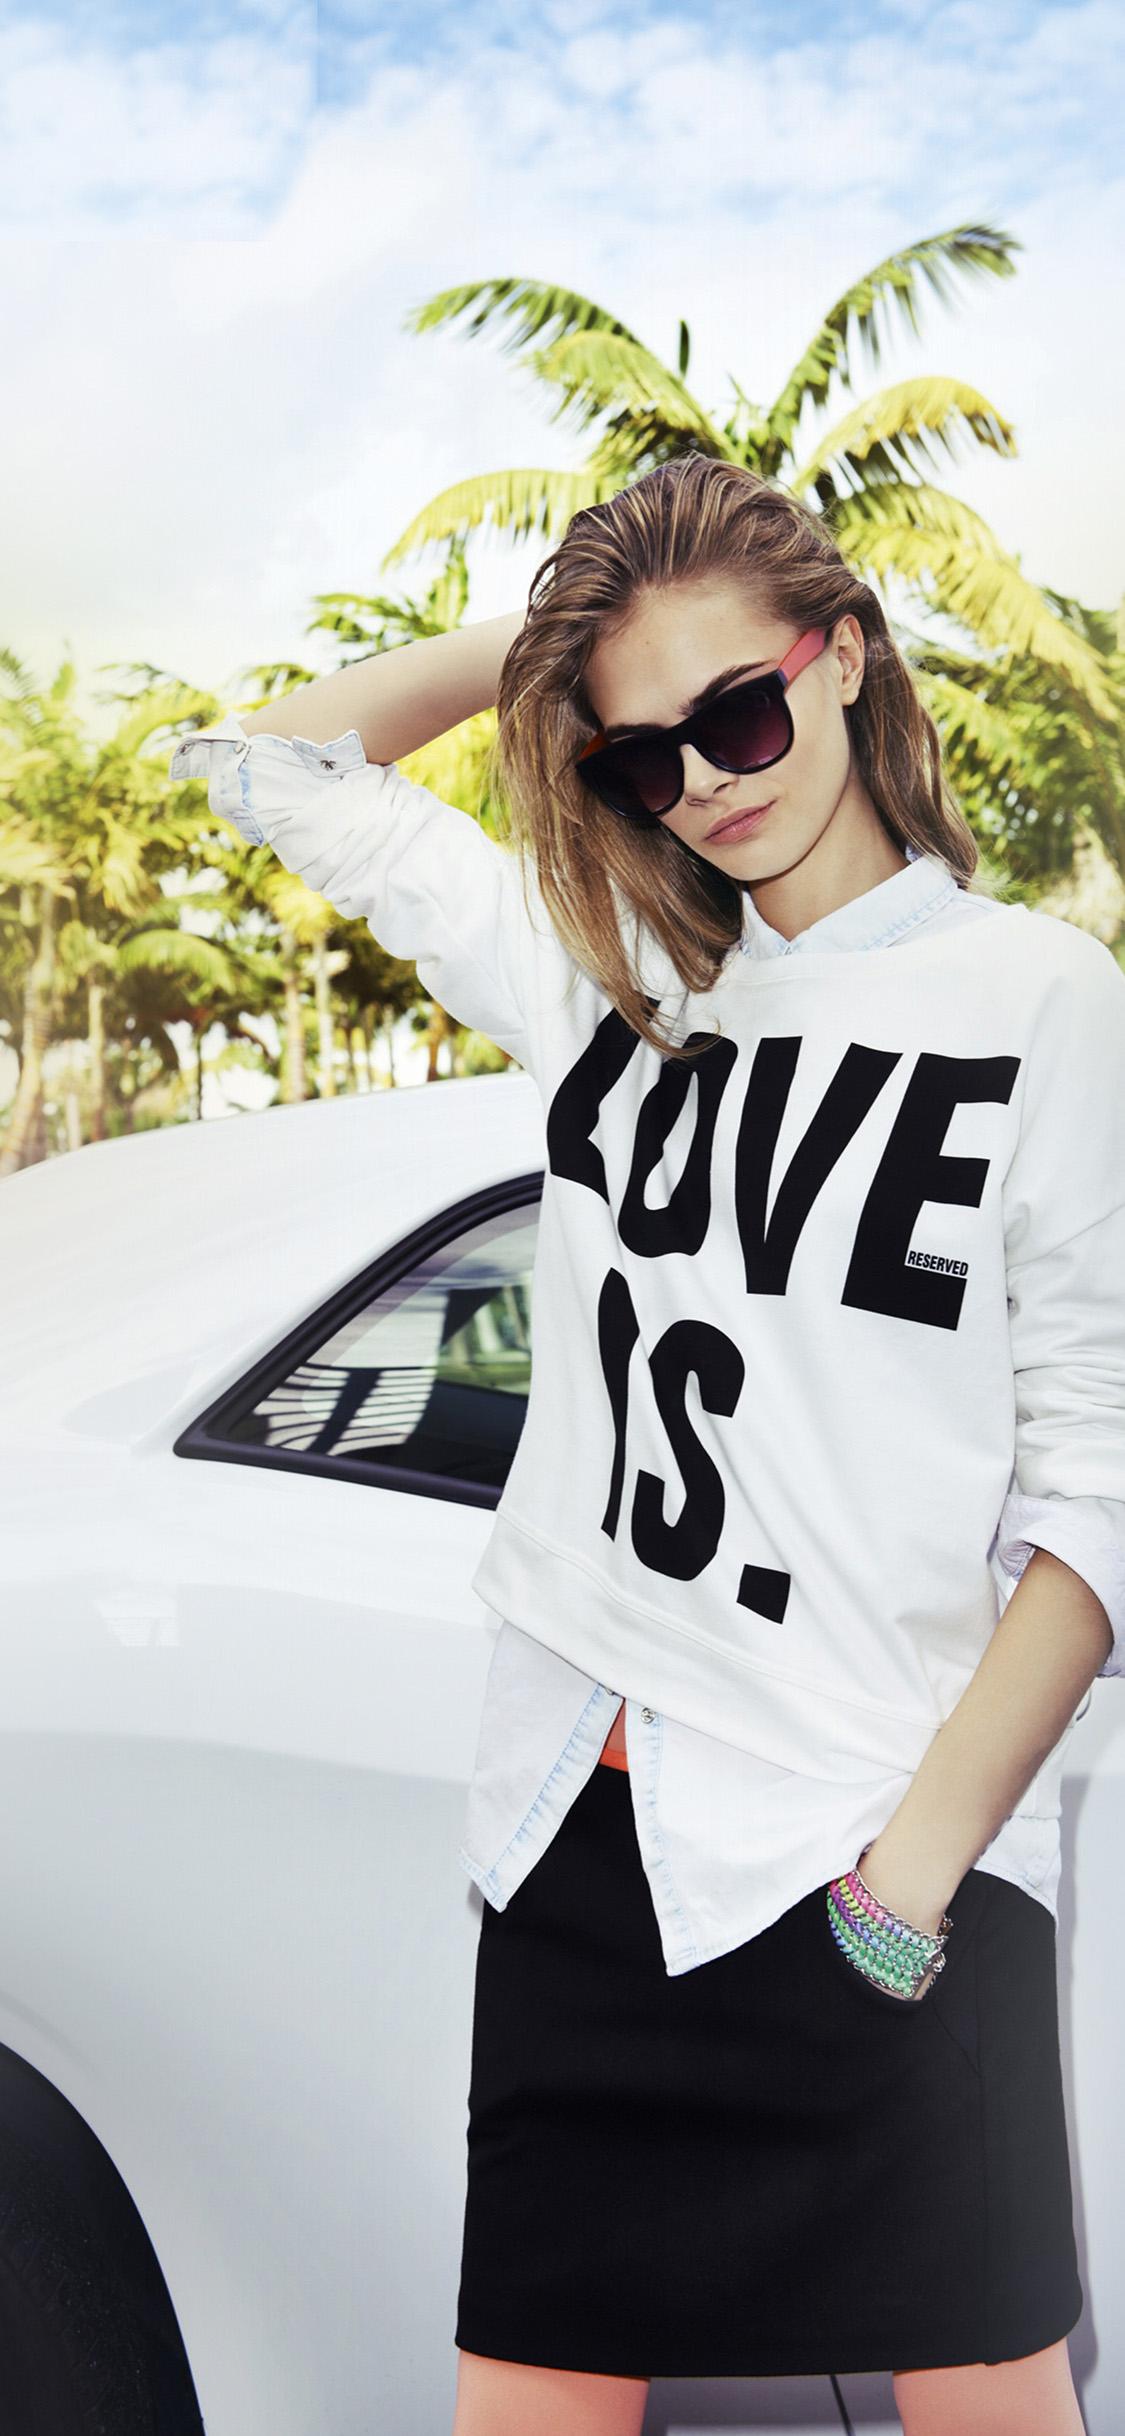 iPhonexpapers.com-Apple-iPhone-wallpaper-hp81-cara-delevigne-model-sunglass-summer-girl